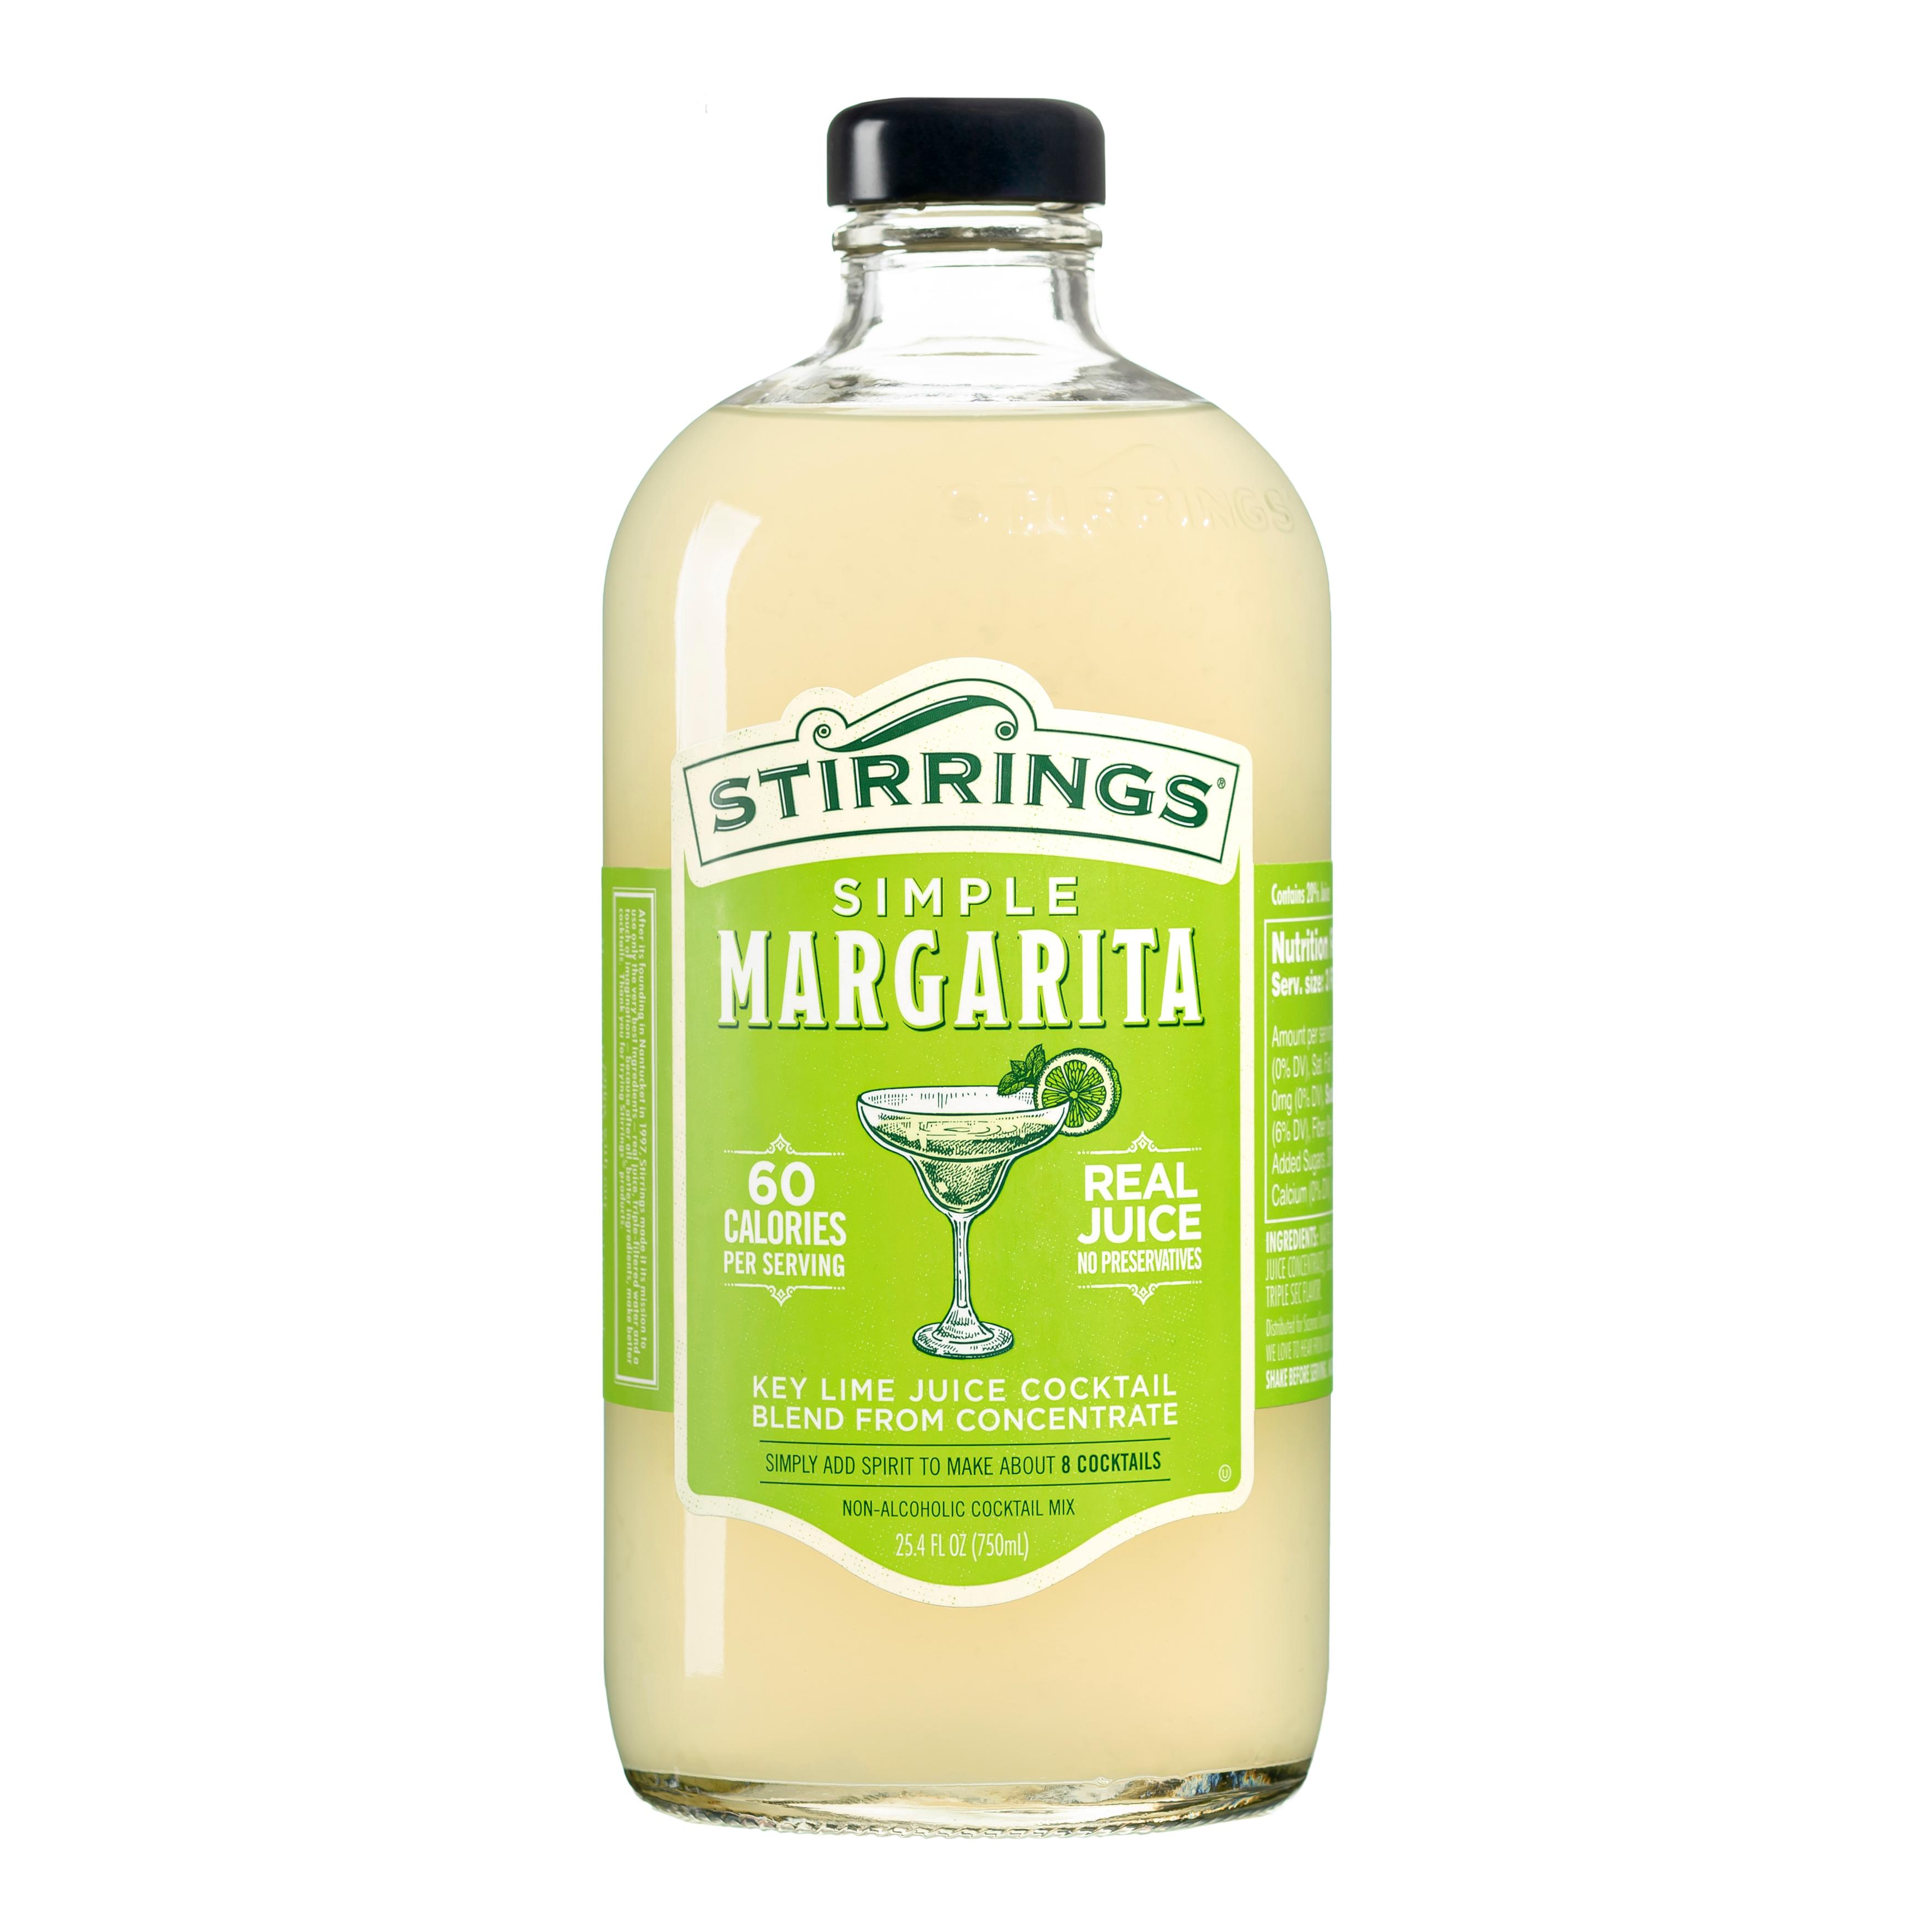 Simple Margarita